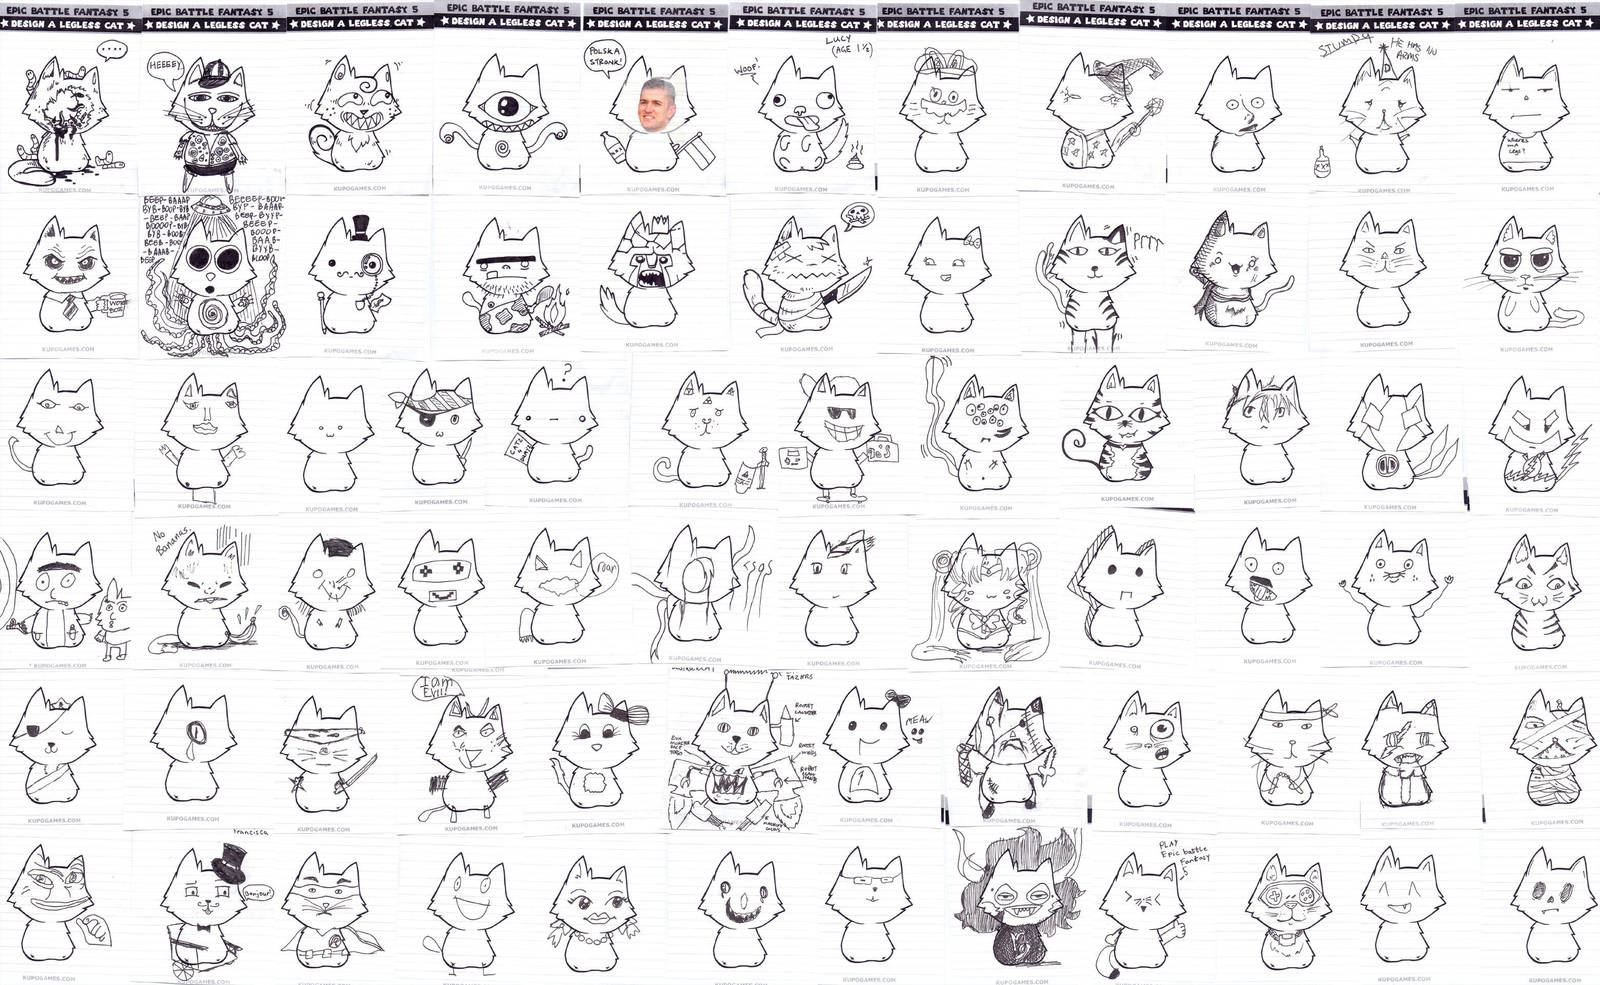 No-Legged Cats by KupoGames